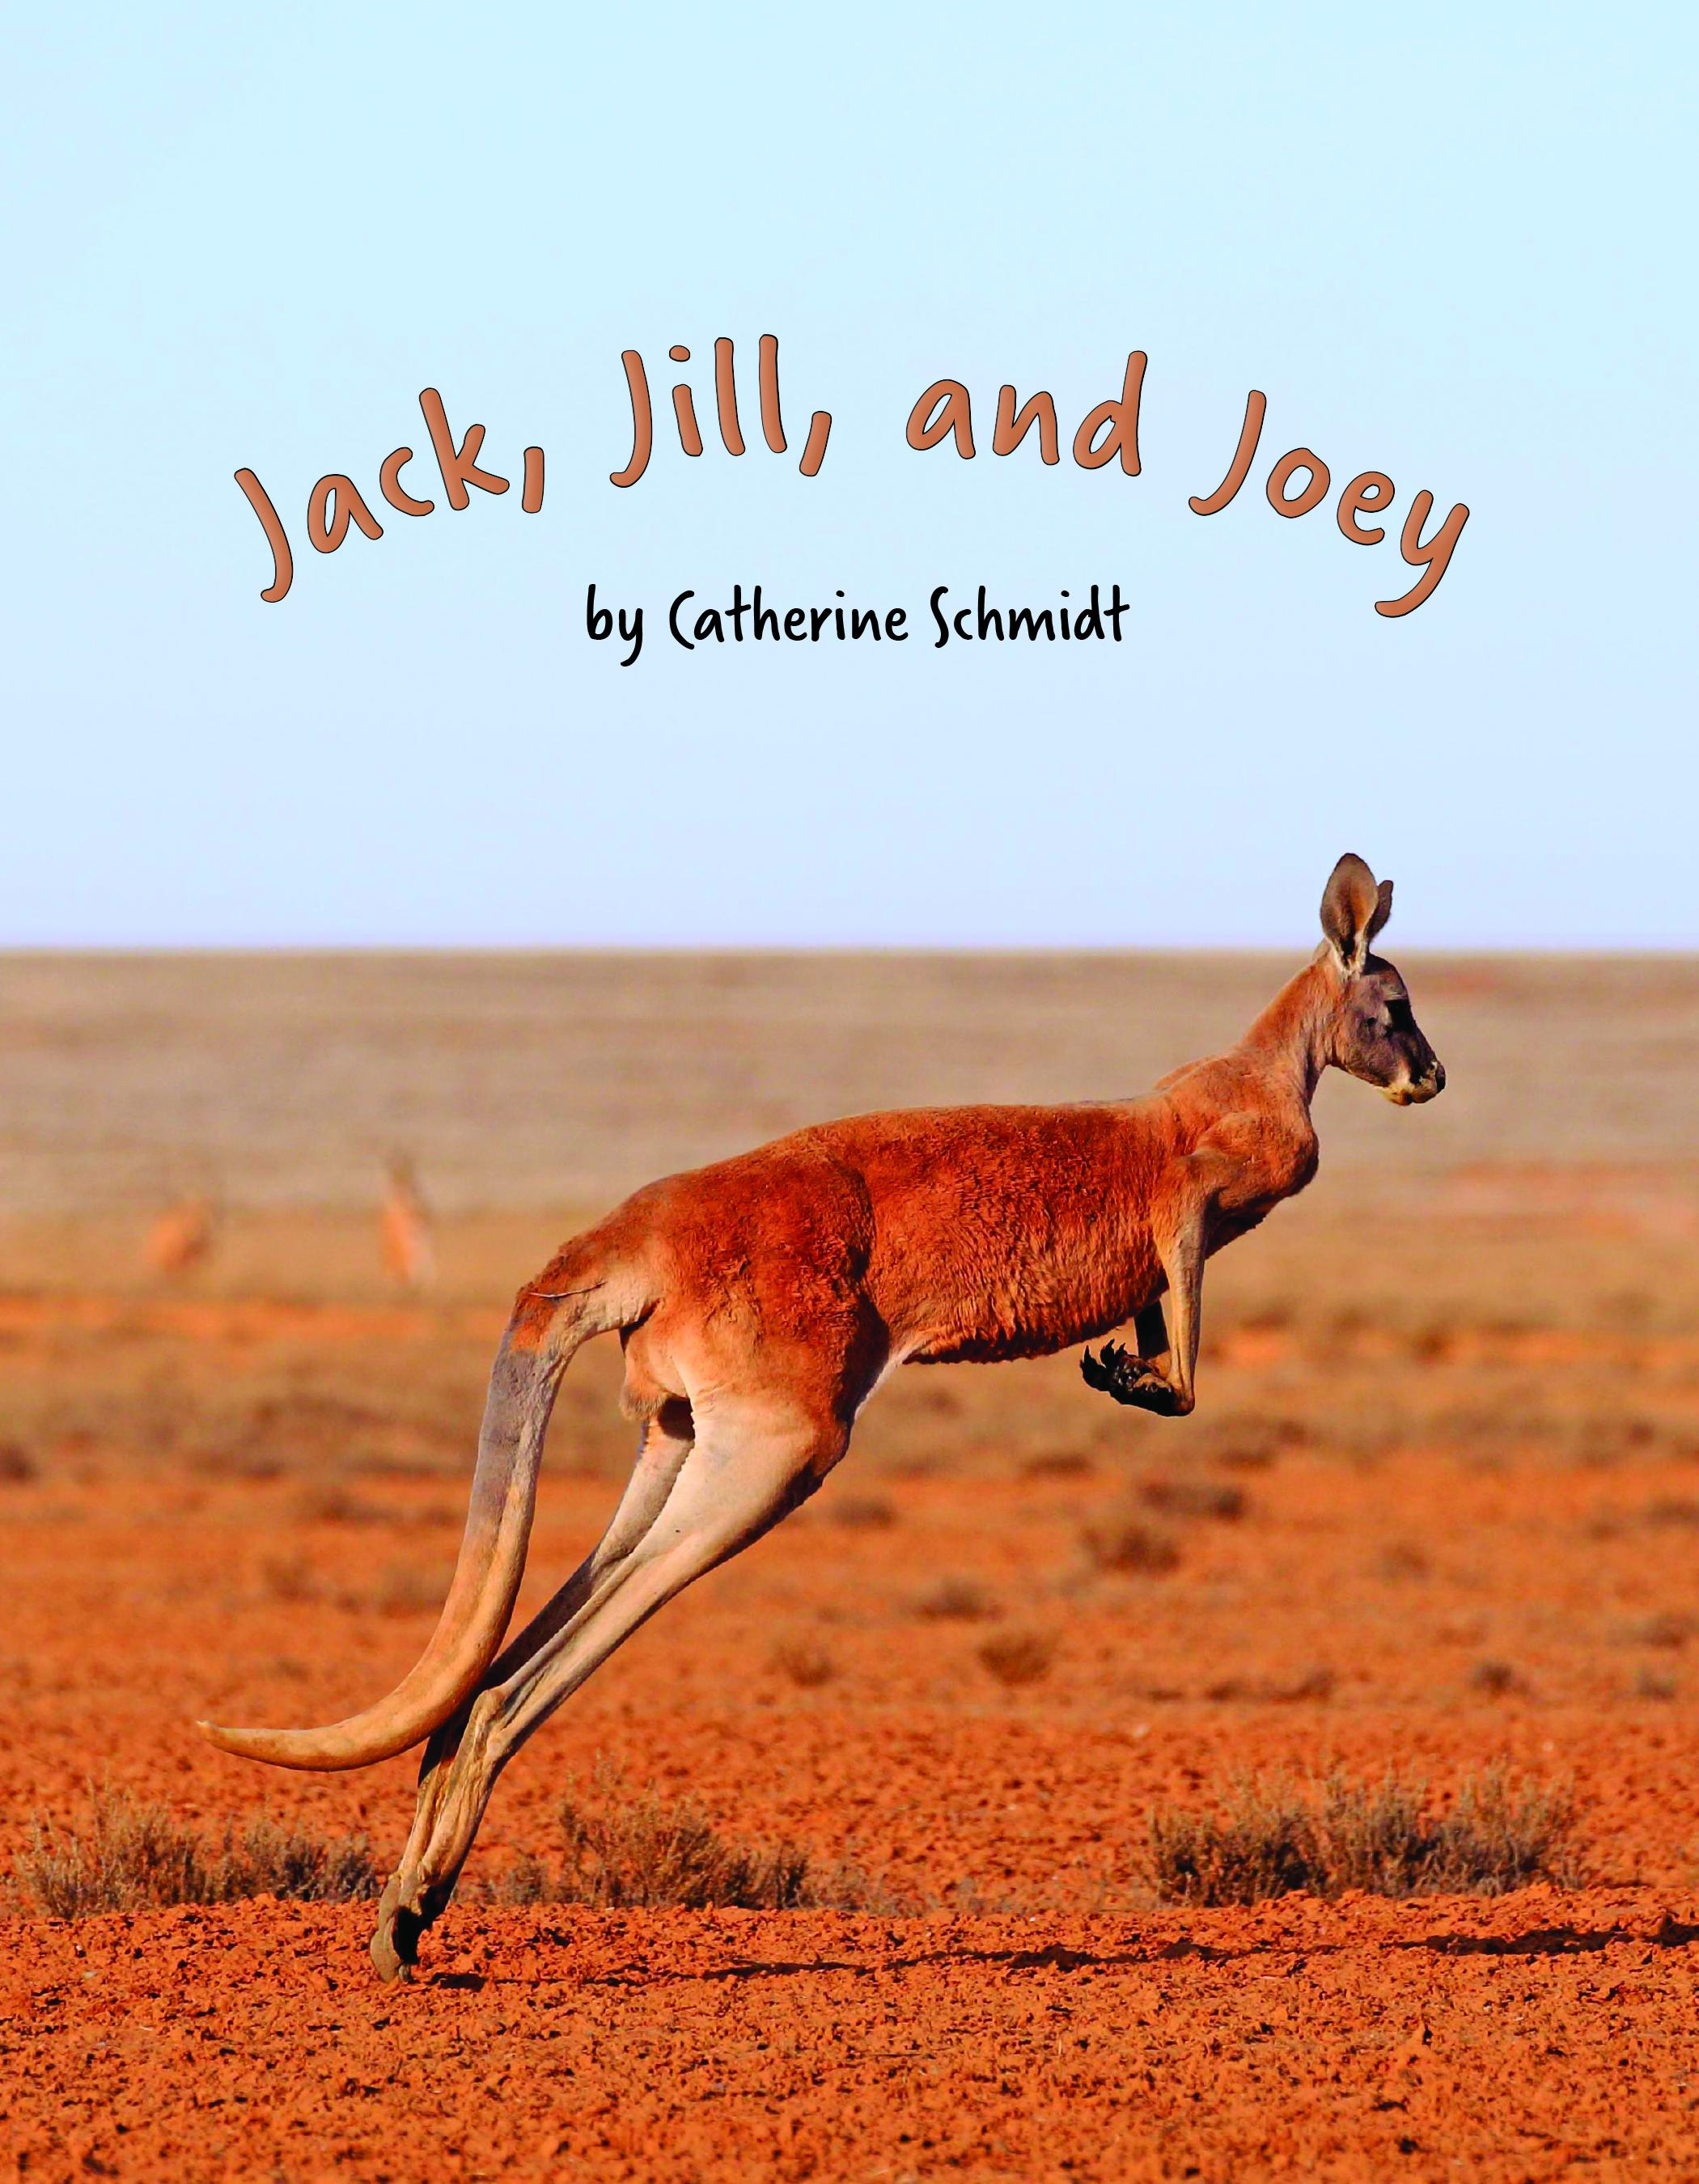 Jack, Jill, and Joey